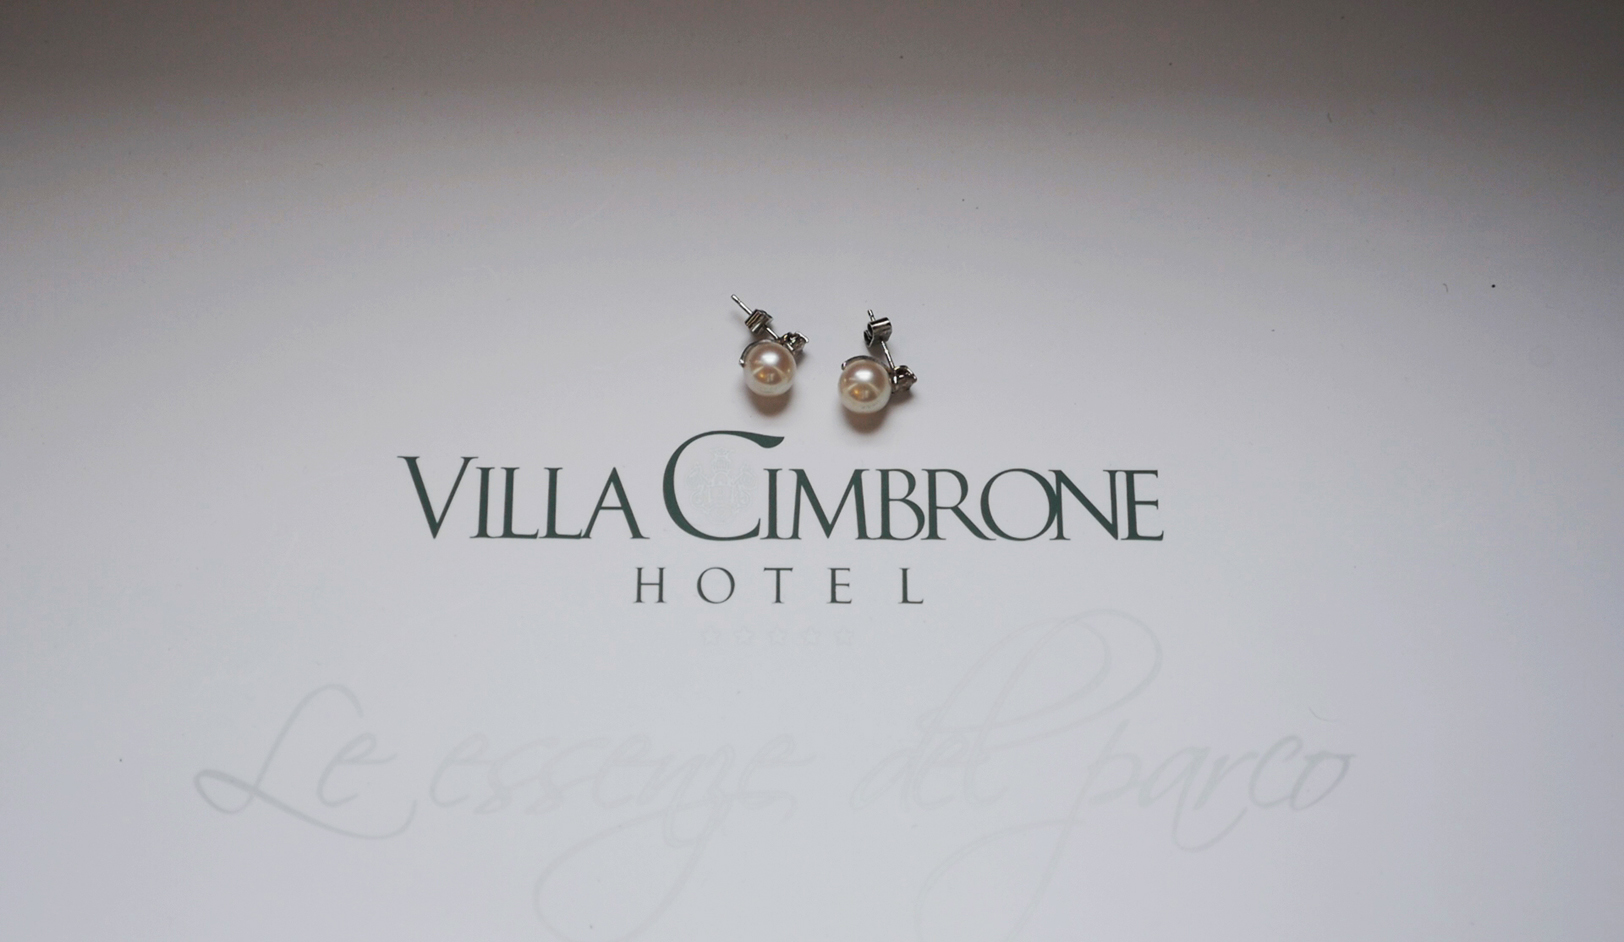 matrimonio-ravello-villa-cimbrone-amalfi-italia.jpg